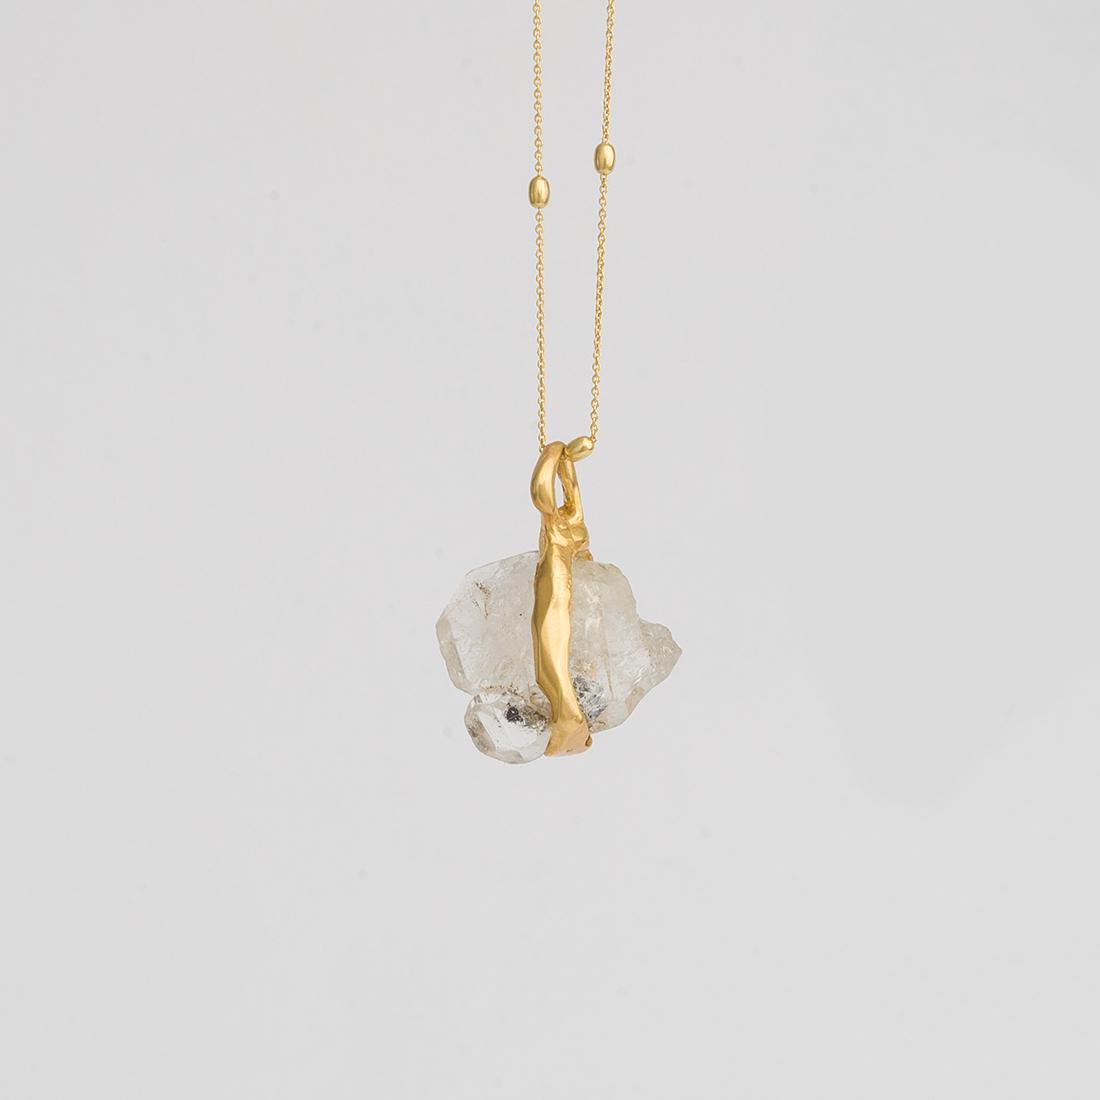 150.NEAERA2-necklacetg